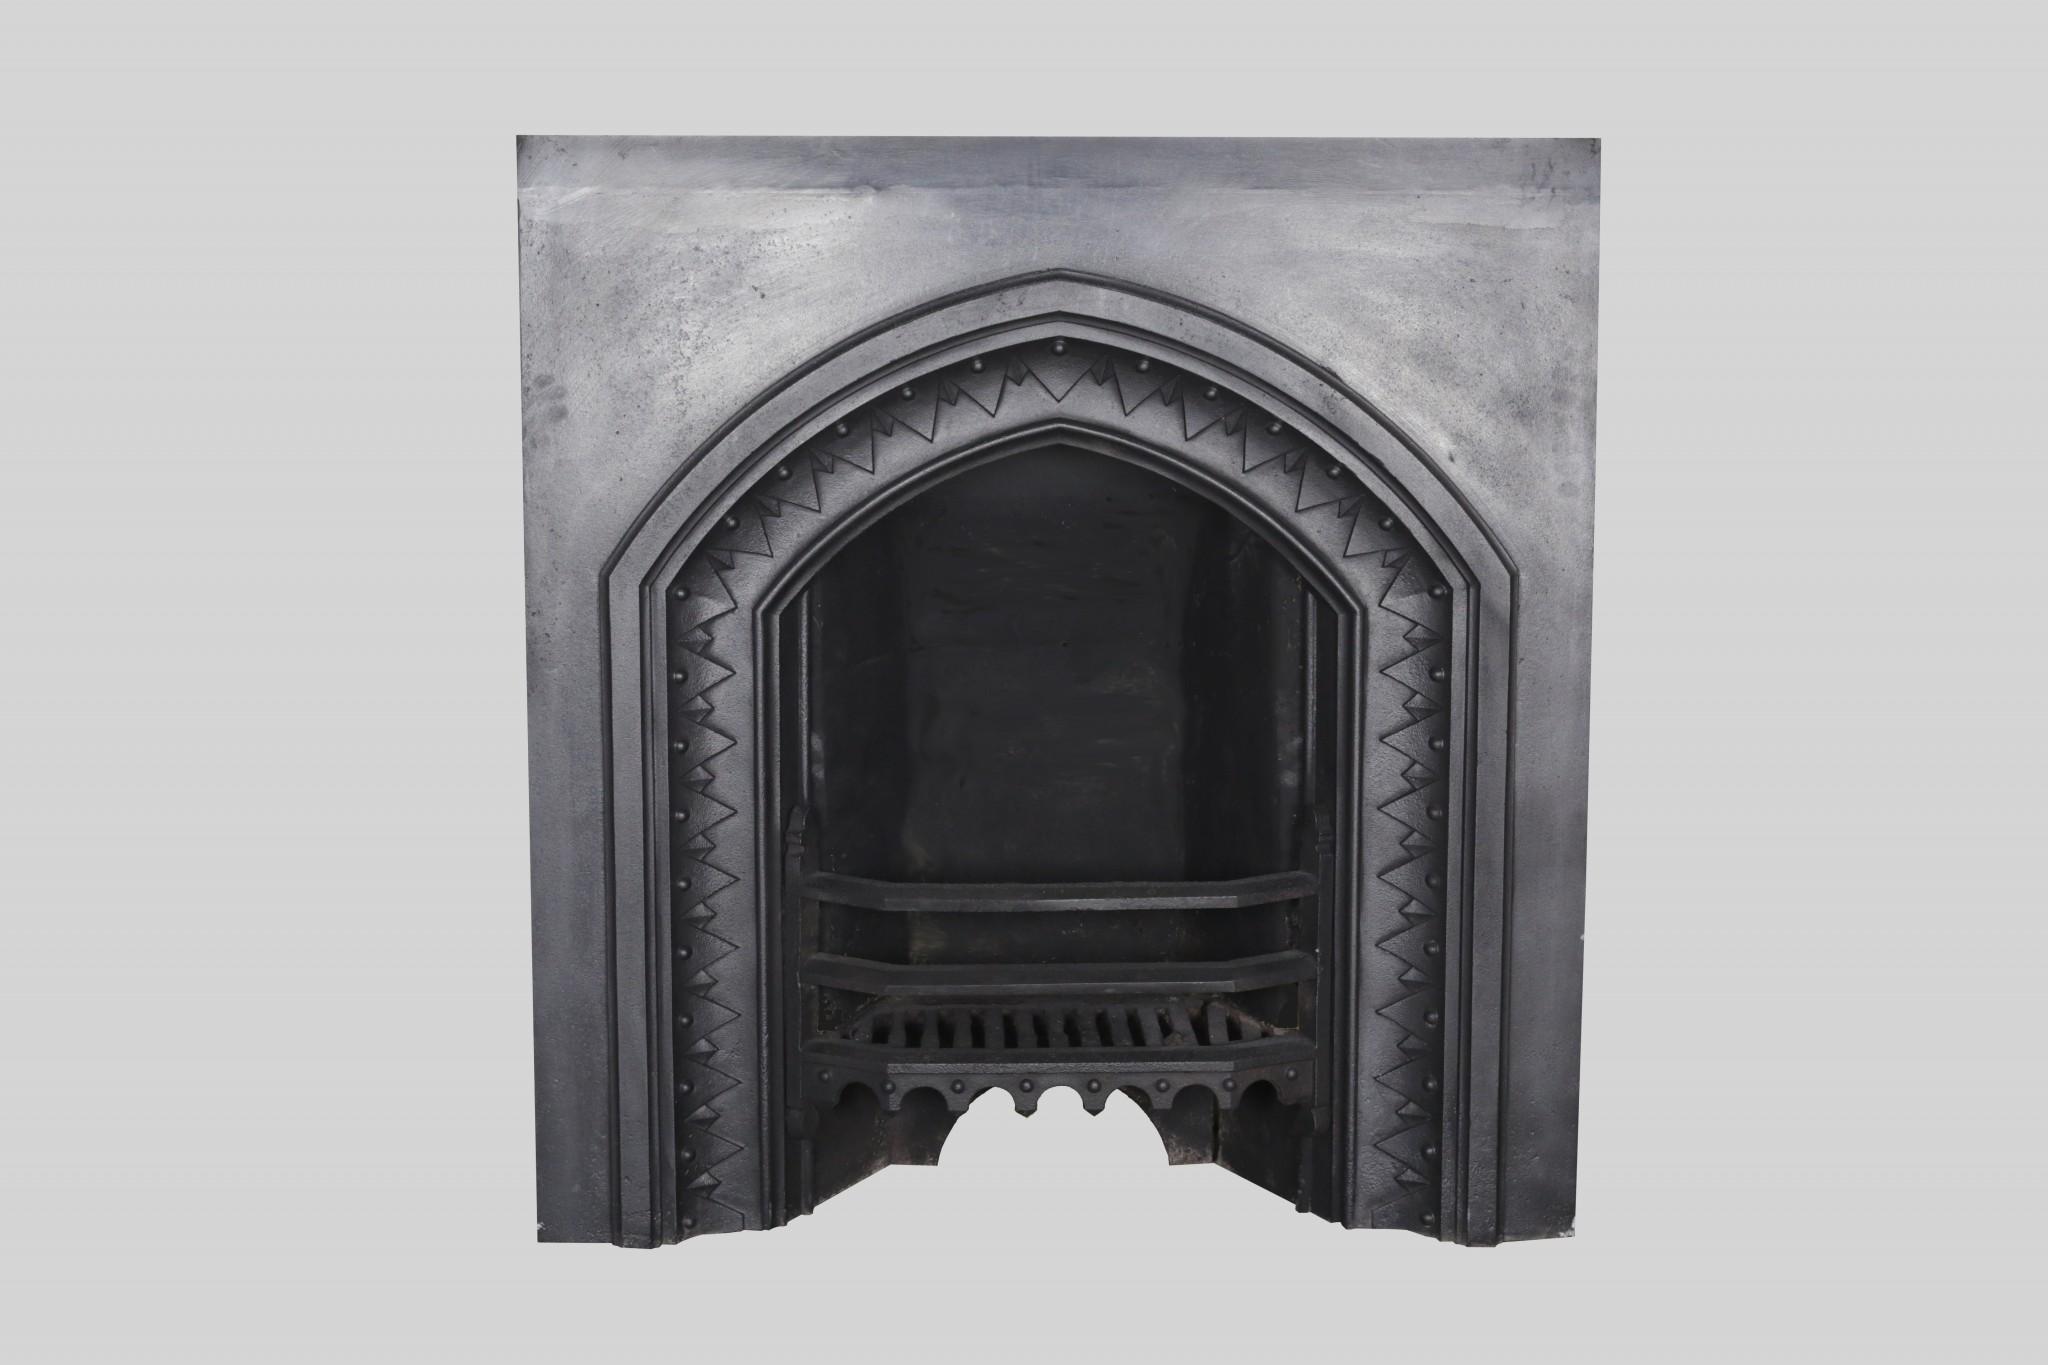 Gothic Revival Cast Iron Insert Fireplace Restoration